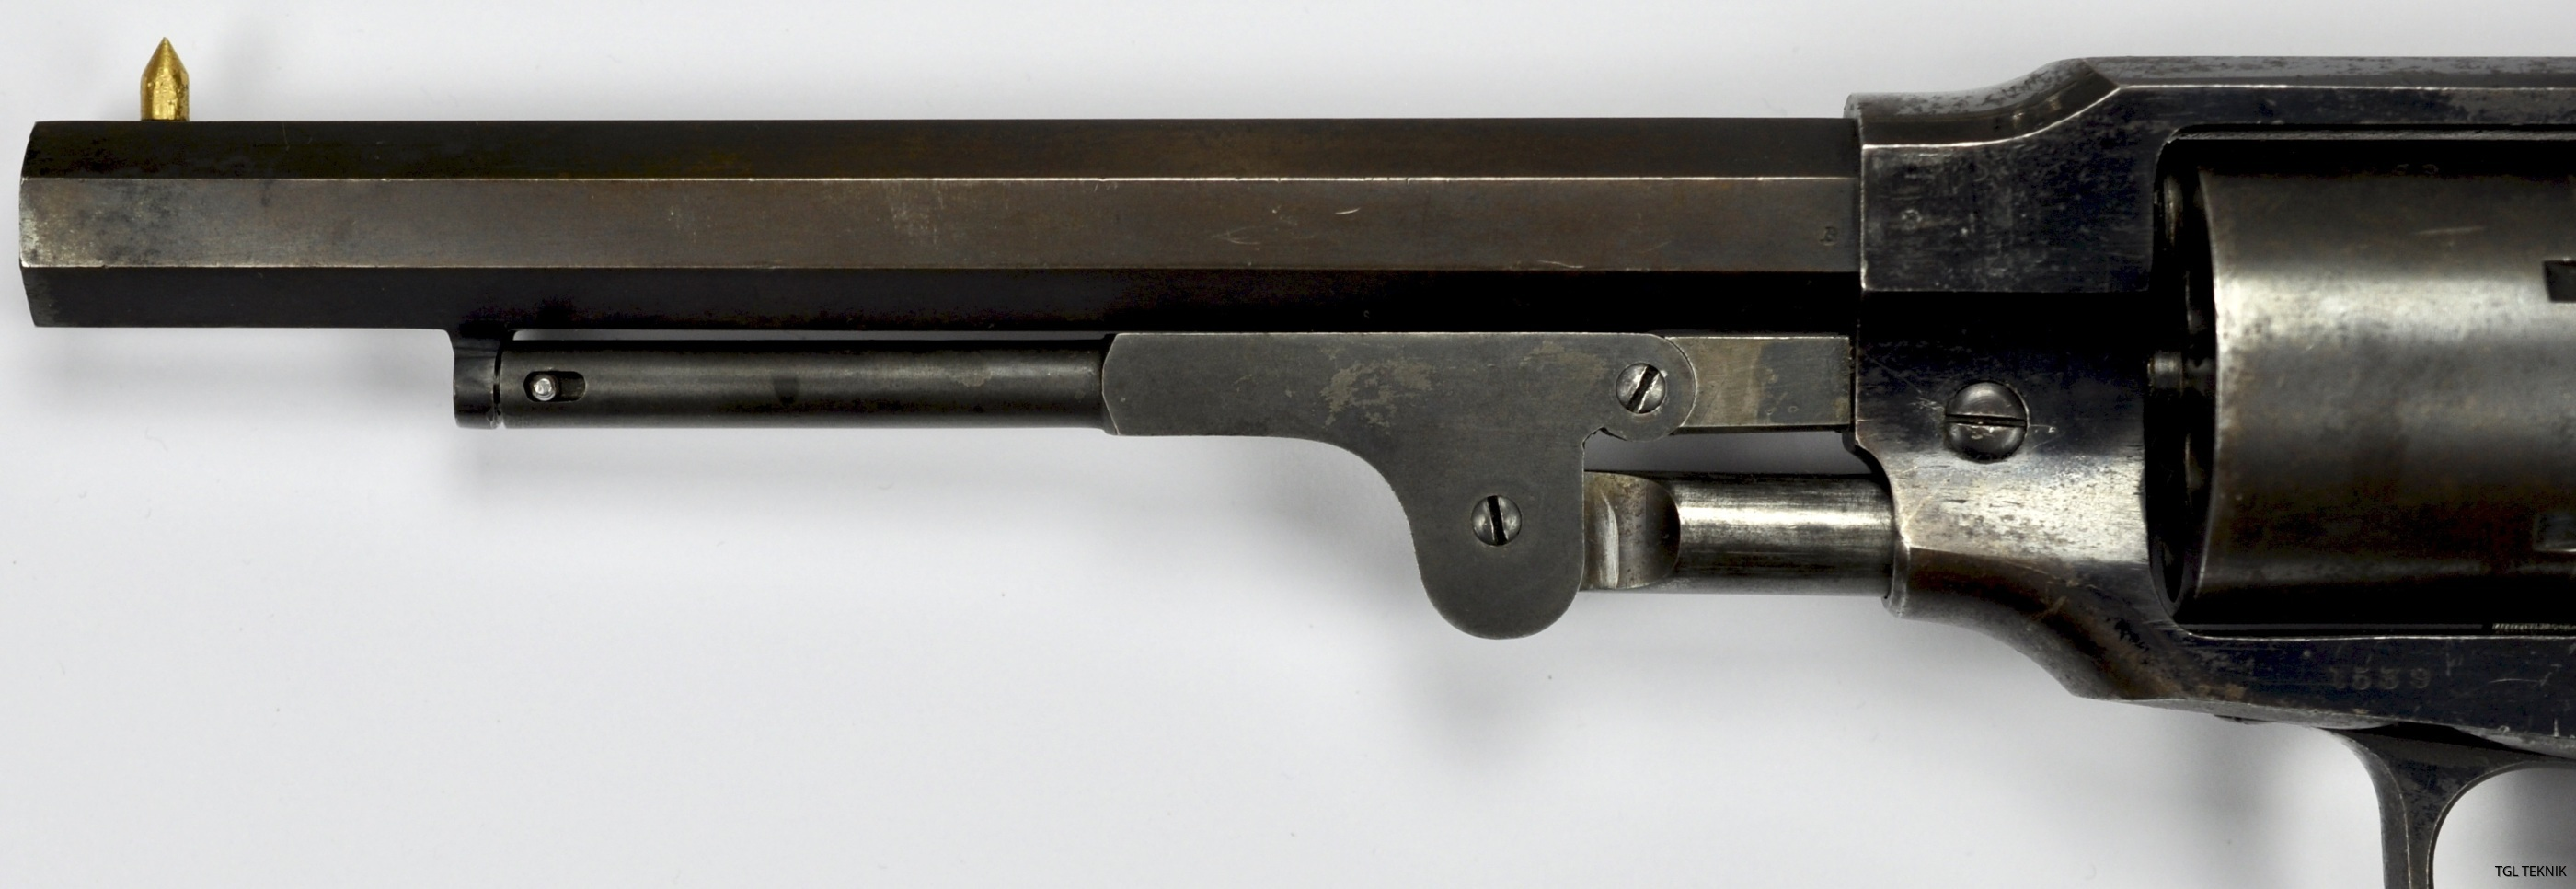 fullsizeoutput_1823